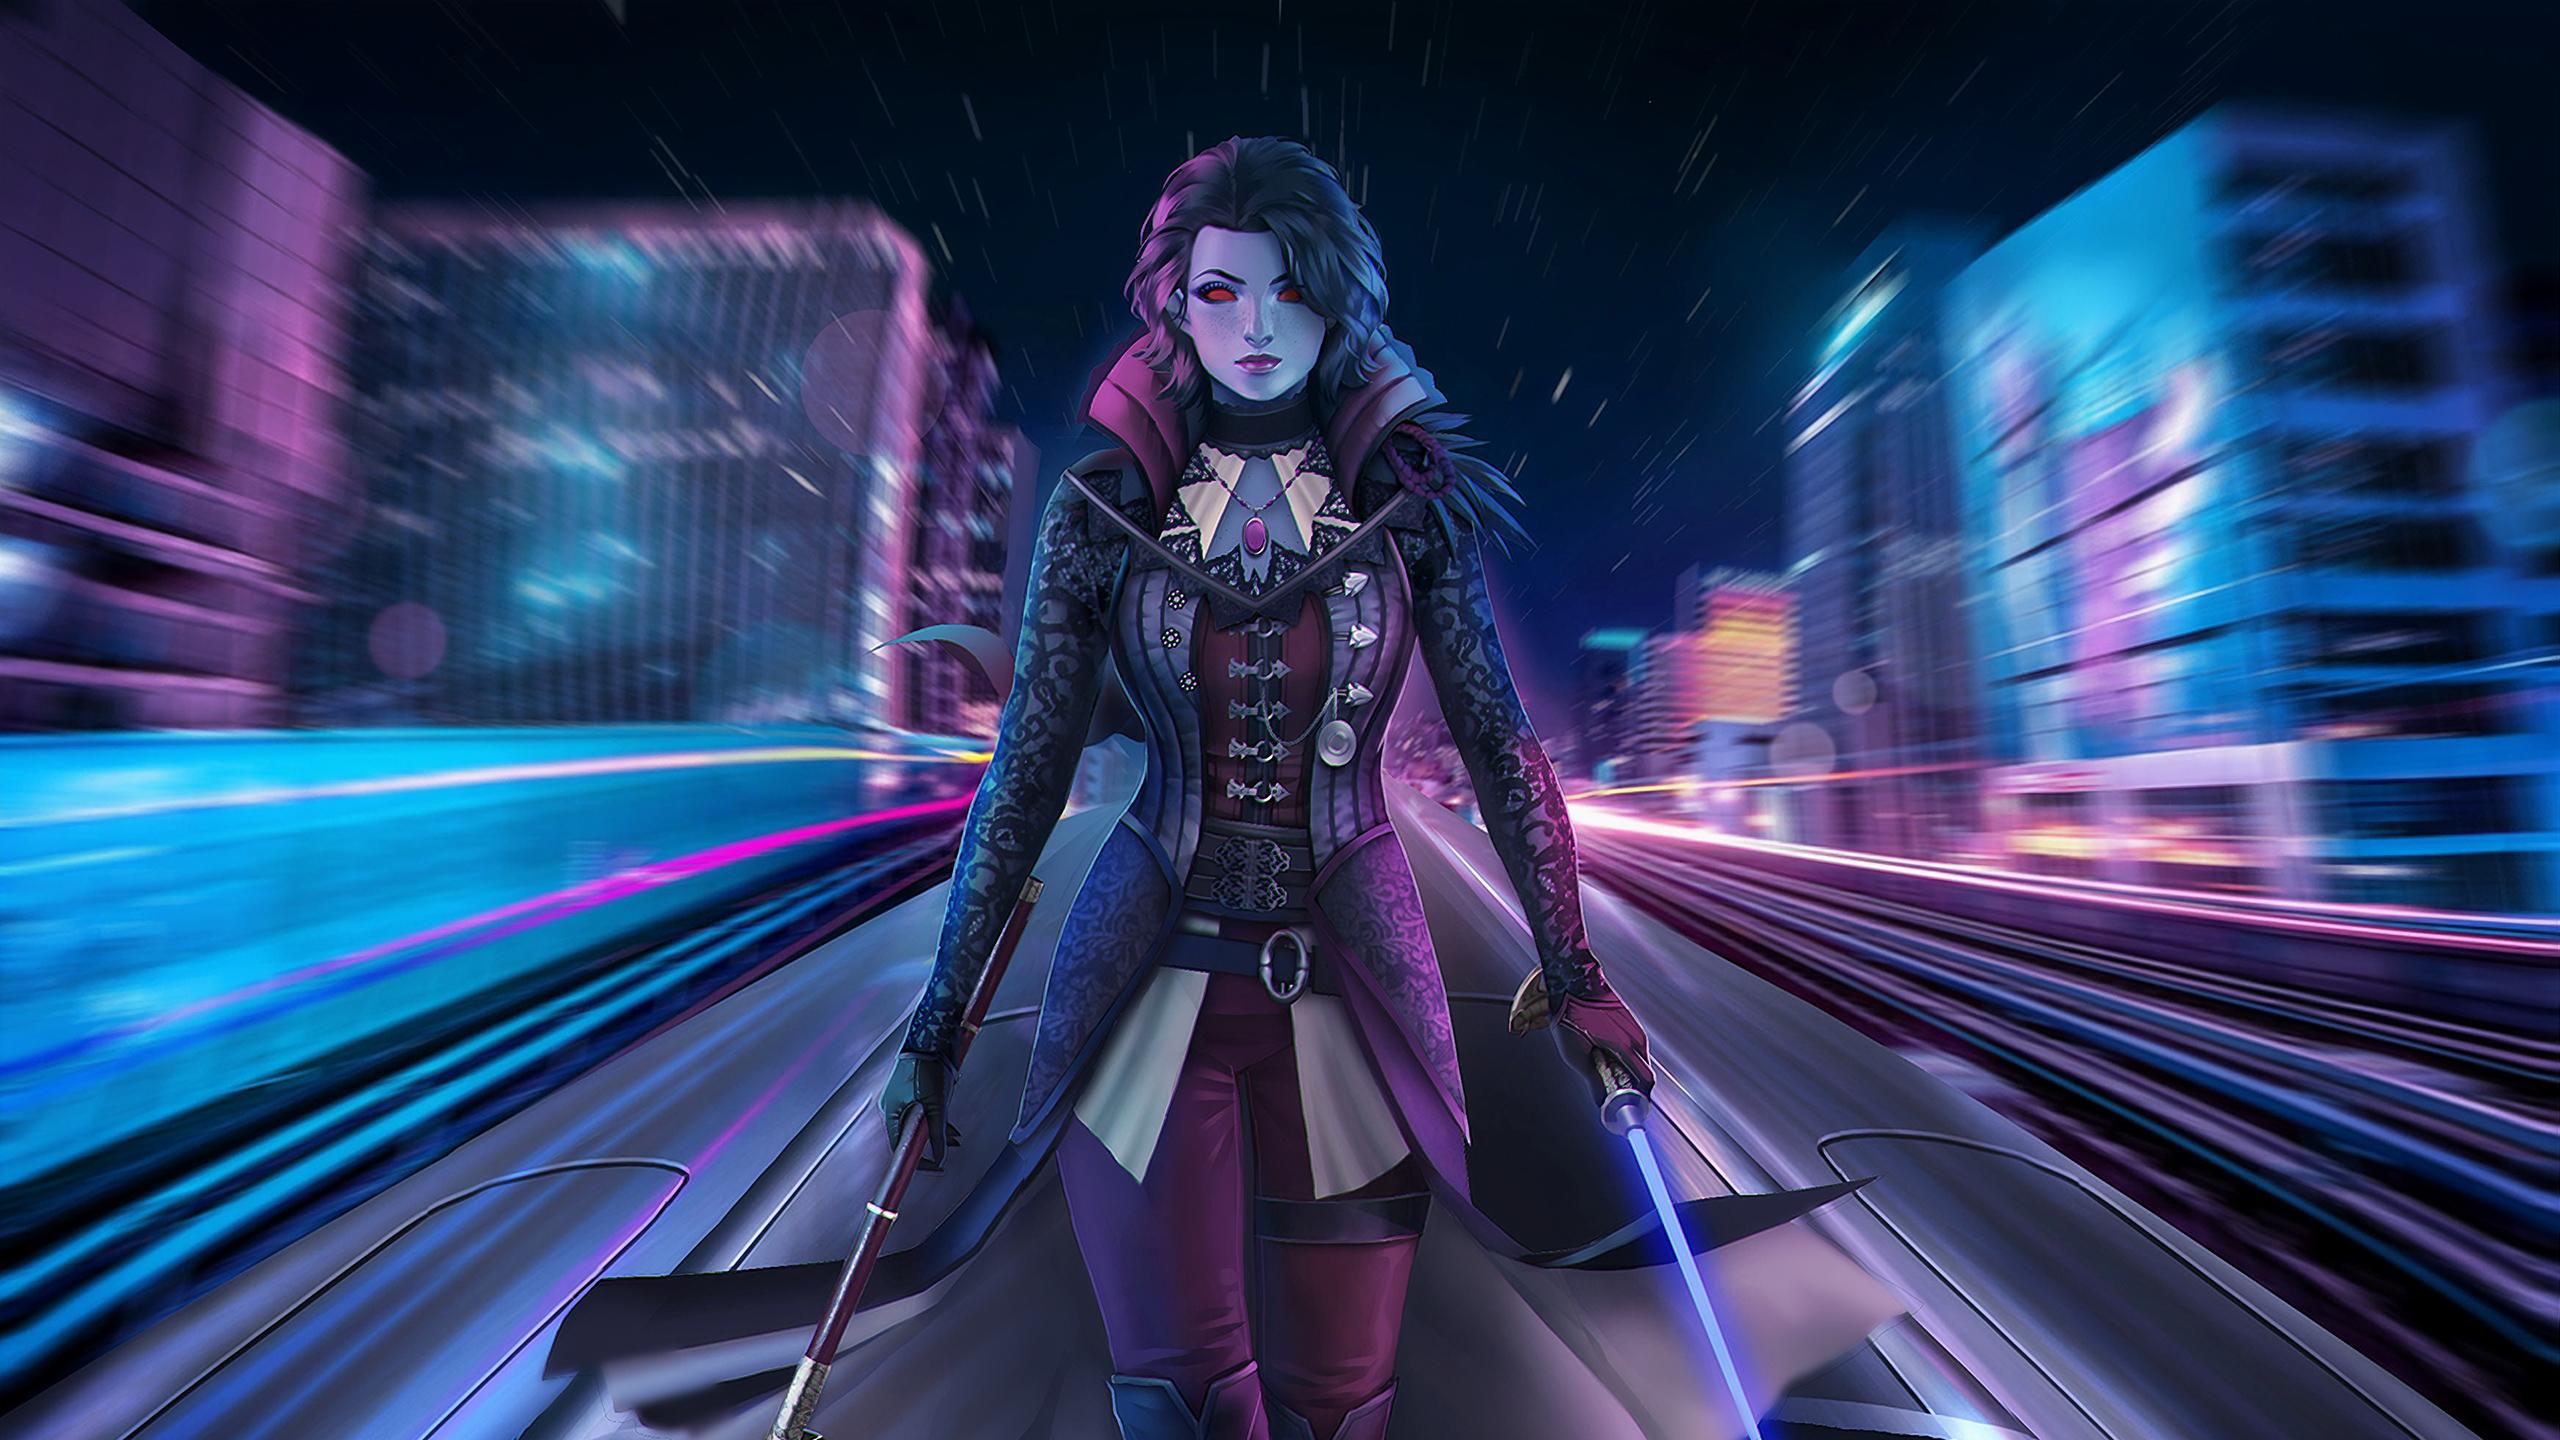 General 2560x1440 digital digital art artwork women weapon bokeh fantasy girl cyber cyberpunk neon lights neon lights city lightsaber science fiction city lights long exposure cyan